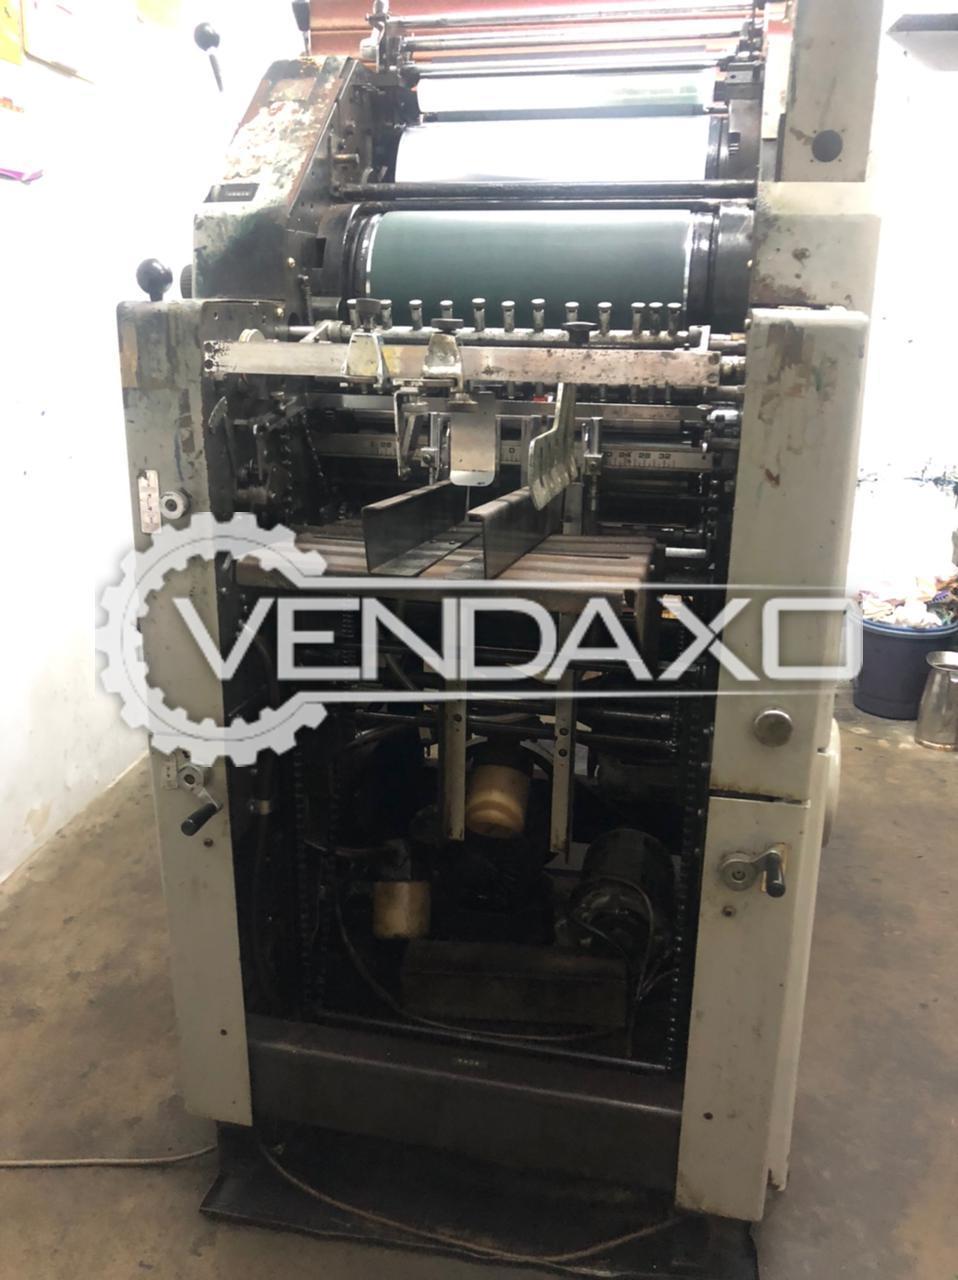 Ryobi 3200 CD Baby Offset Printing Machine - 13 X 18 Inch, Single Color